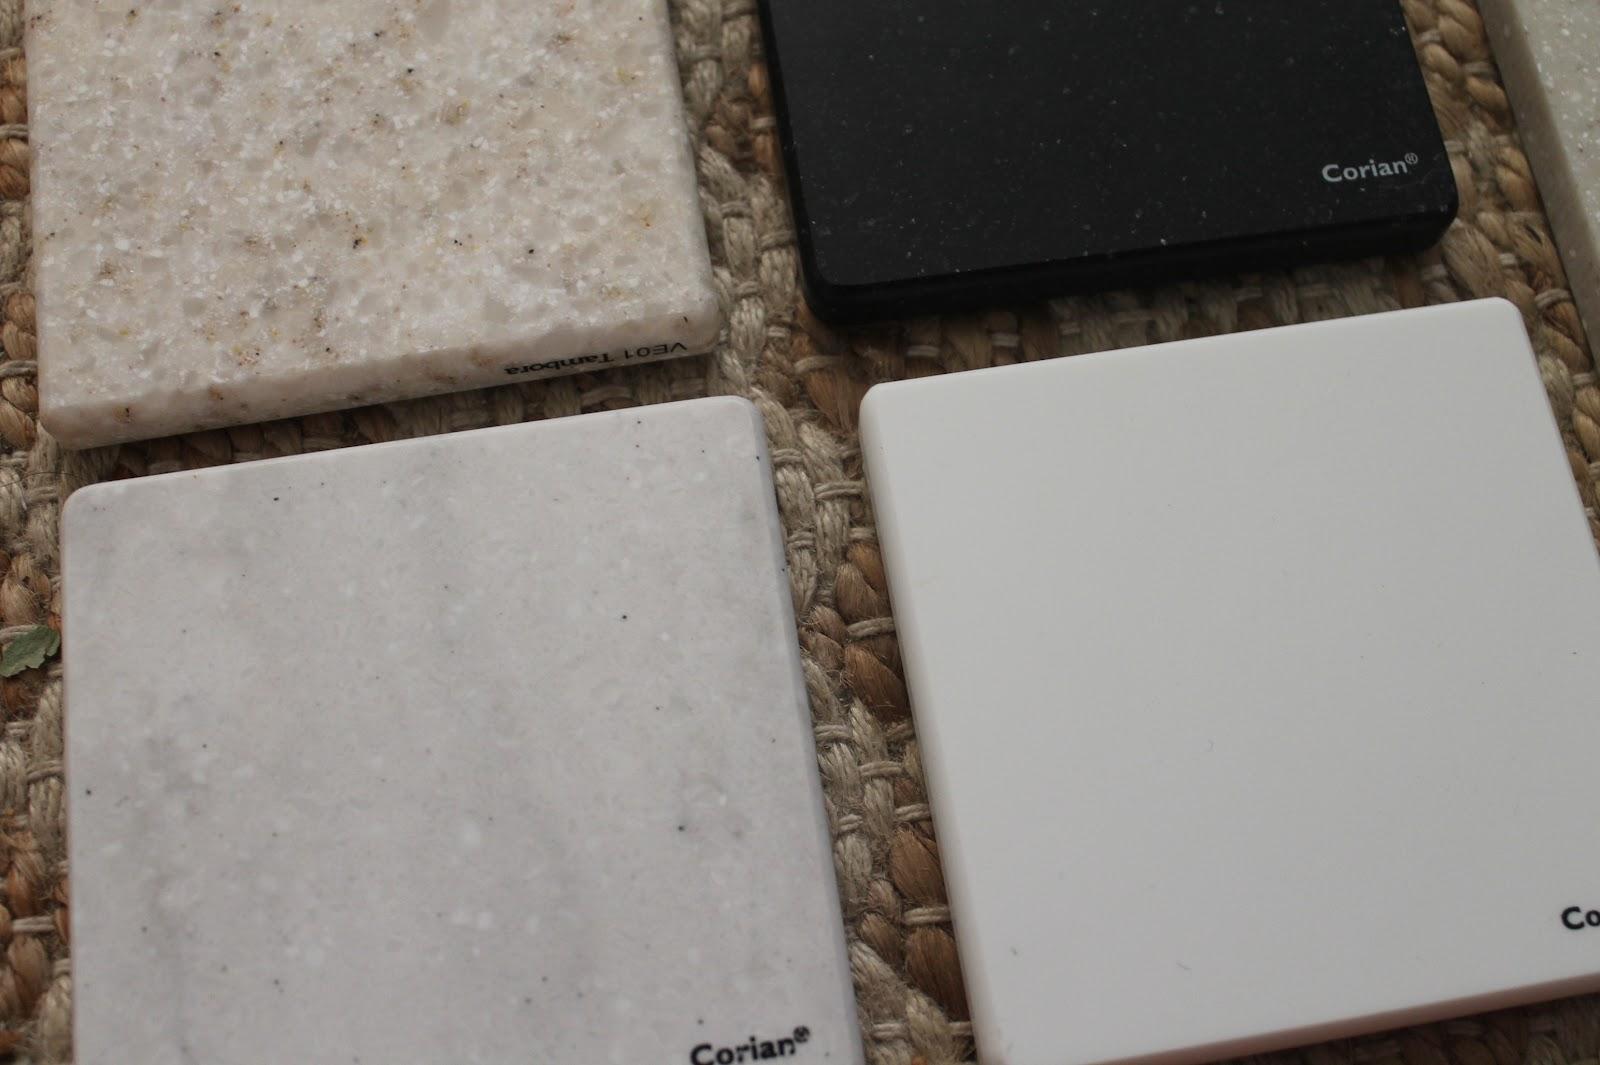 Counter samples home depot center - Option 1